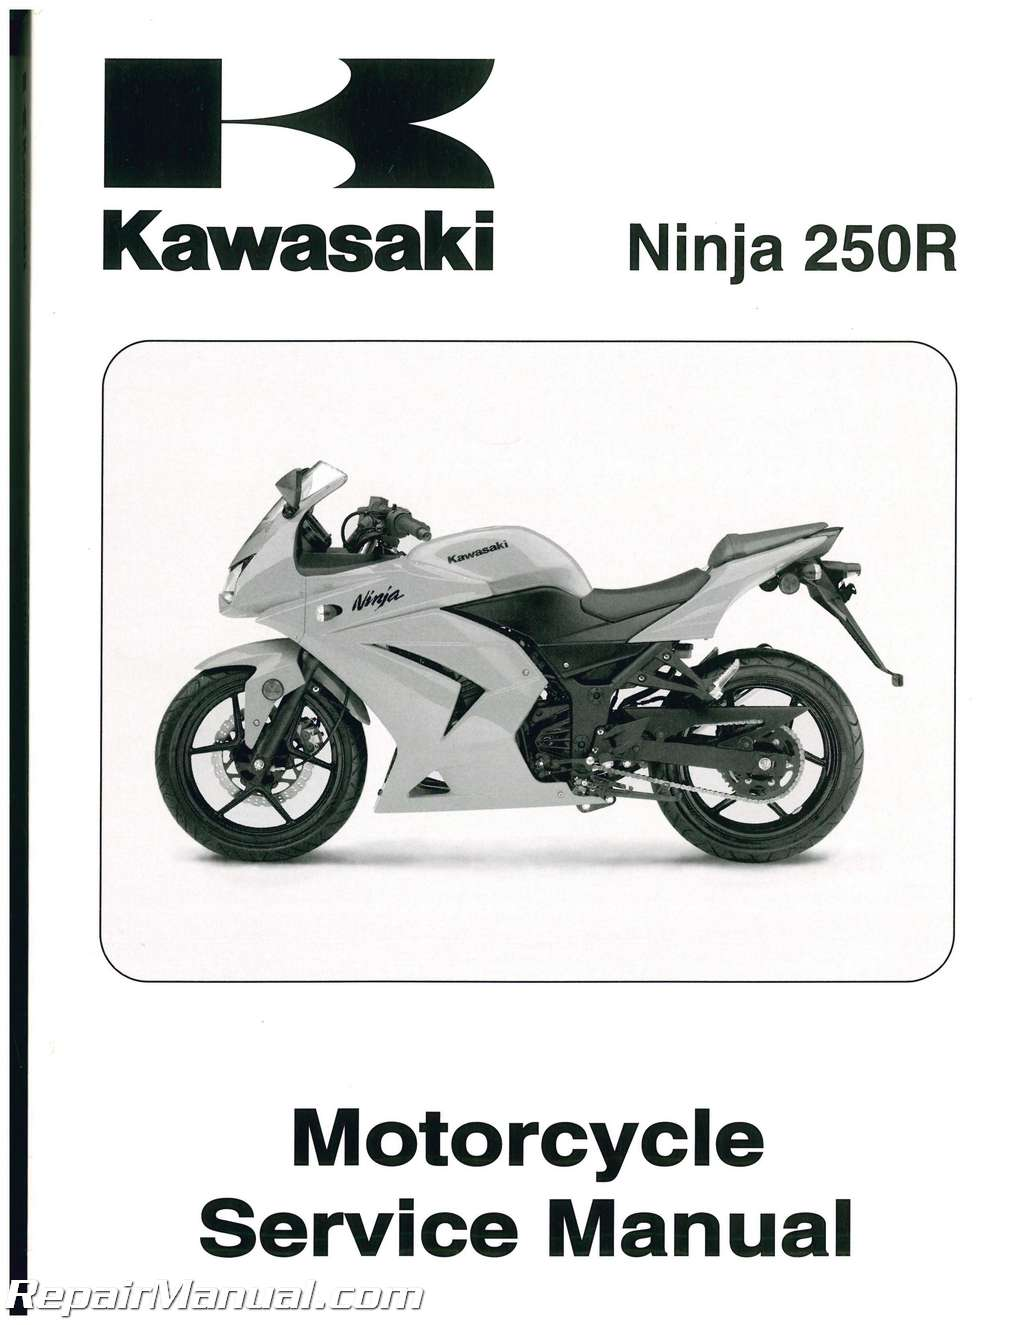 Haynes repair manual kawasaki en500/vulcan 500 (90-07) ex250.